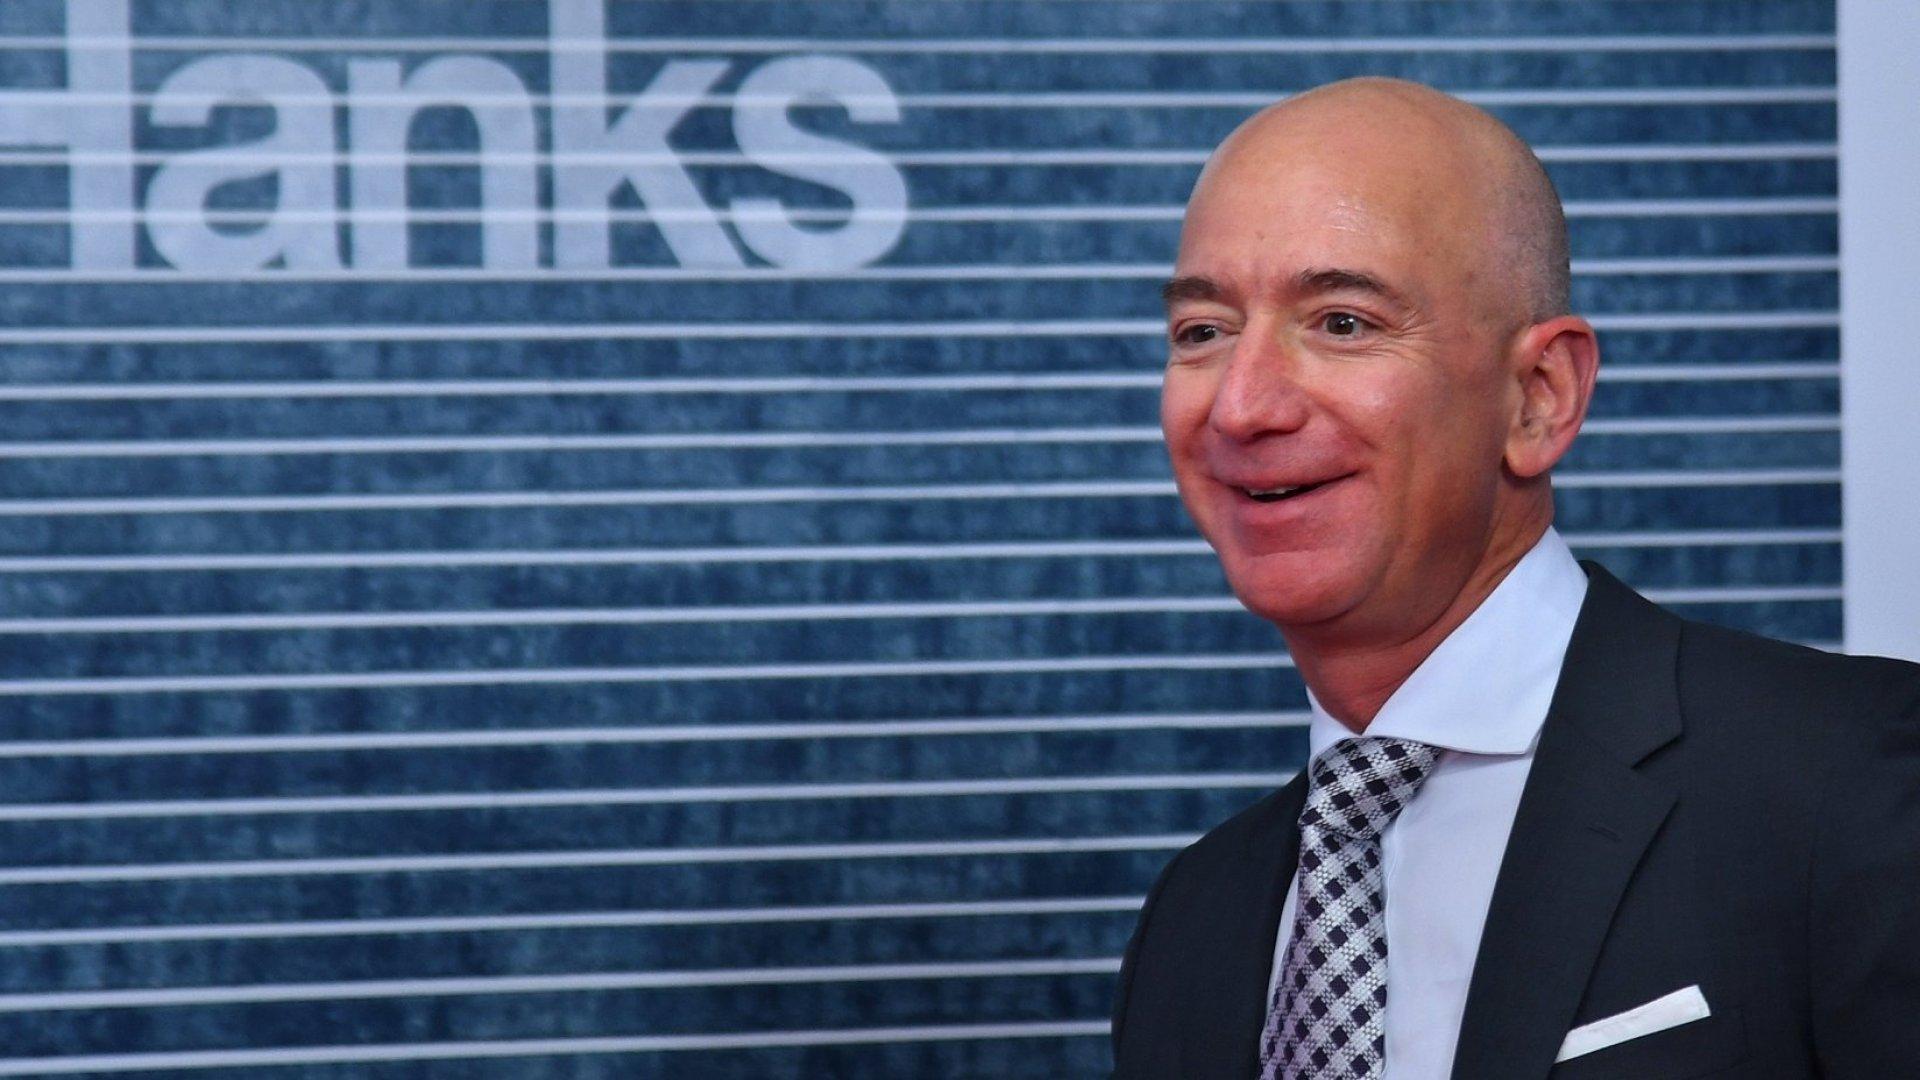 Amazon Founder Jeff Bezos Is Worth Over $112 Billion